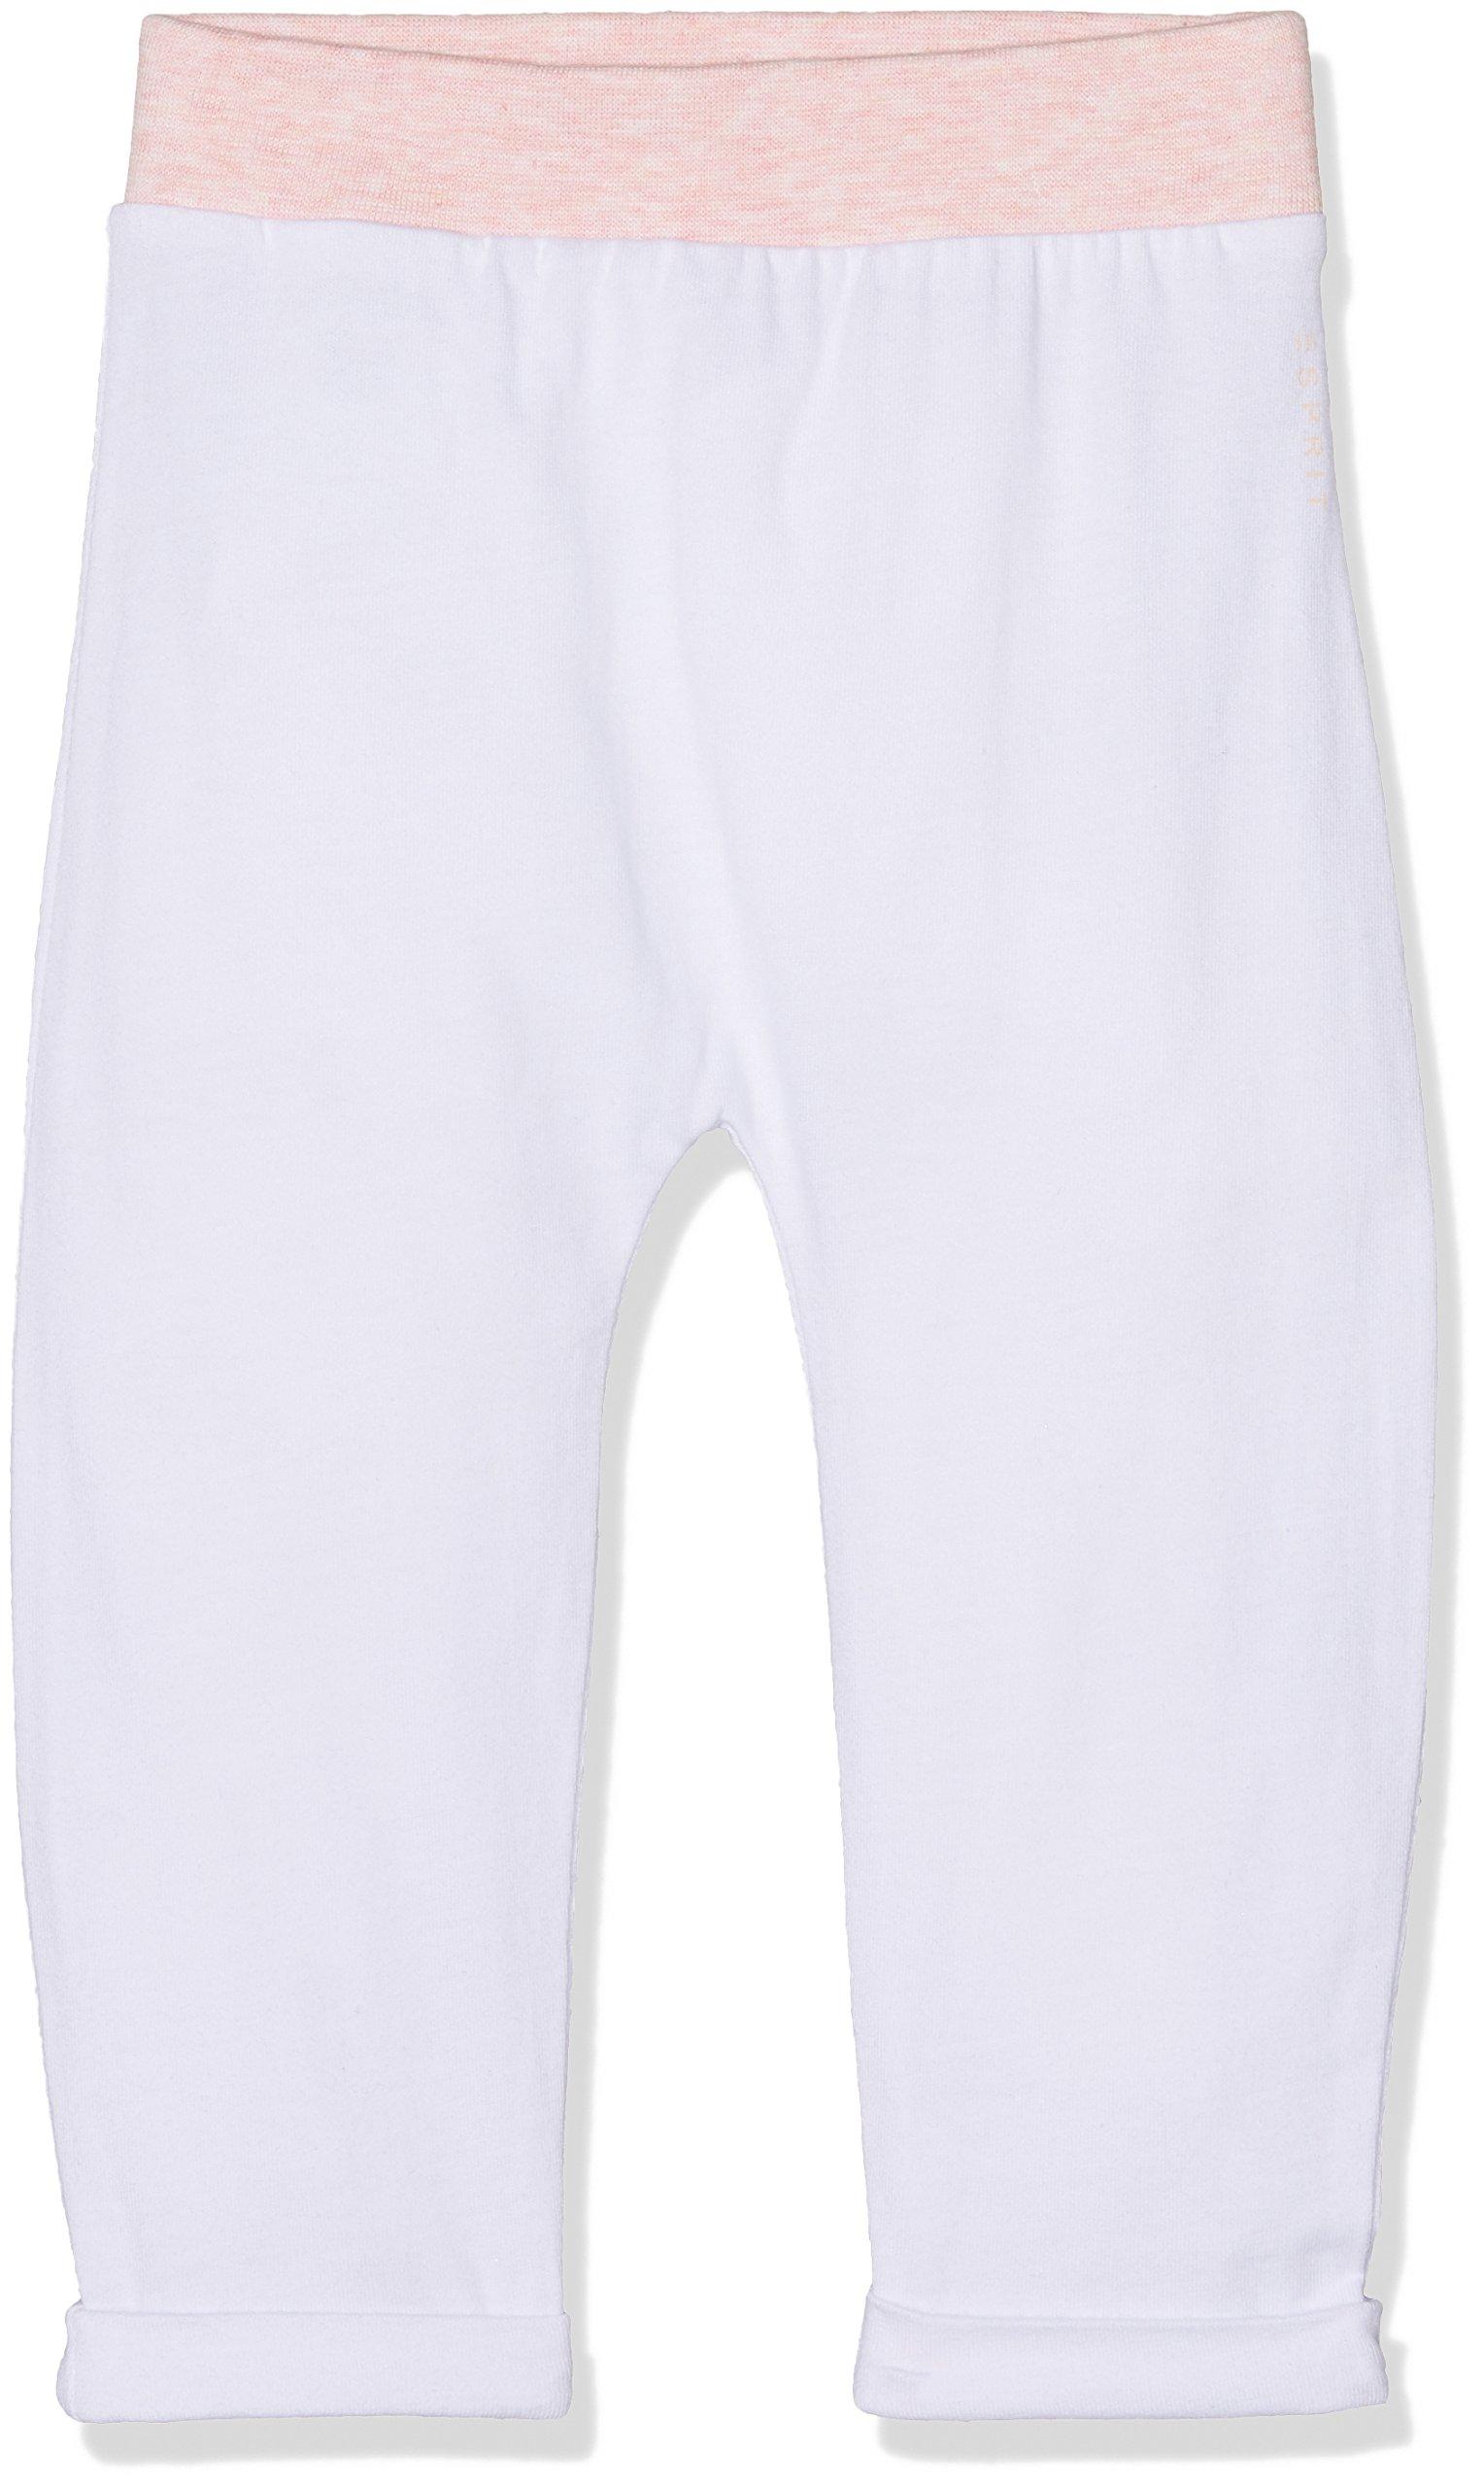 Esprit Pantalones Deportivos Unisex niños